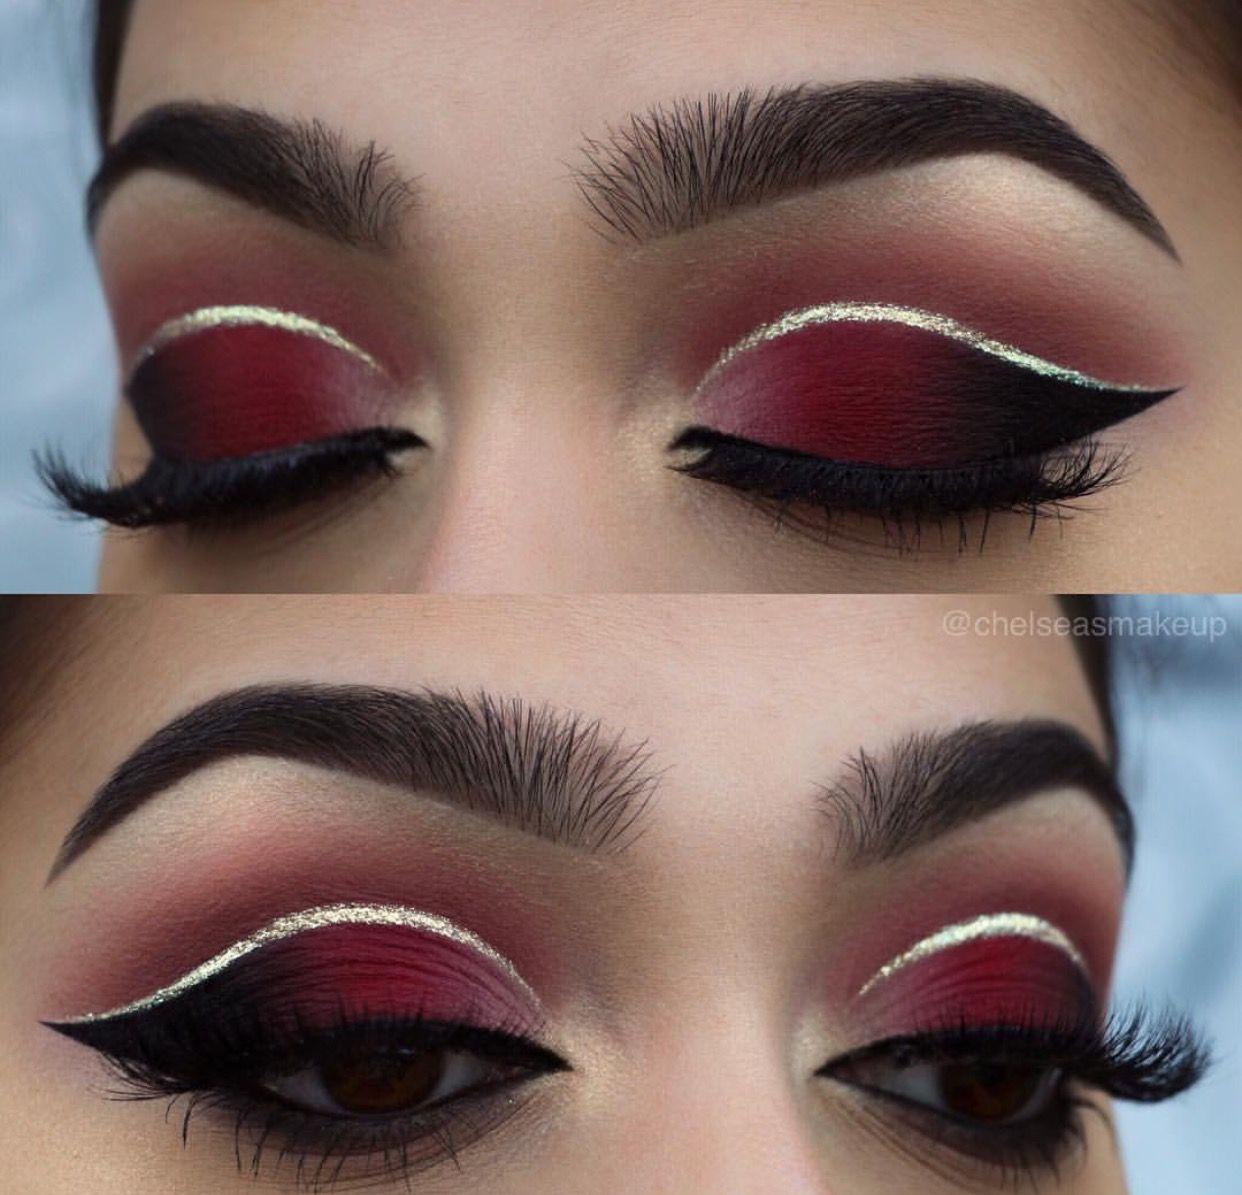 Pin By Chloe Halal On Makeup Pinterest Makeup Eye And Smoky Eye